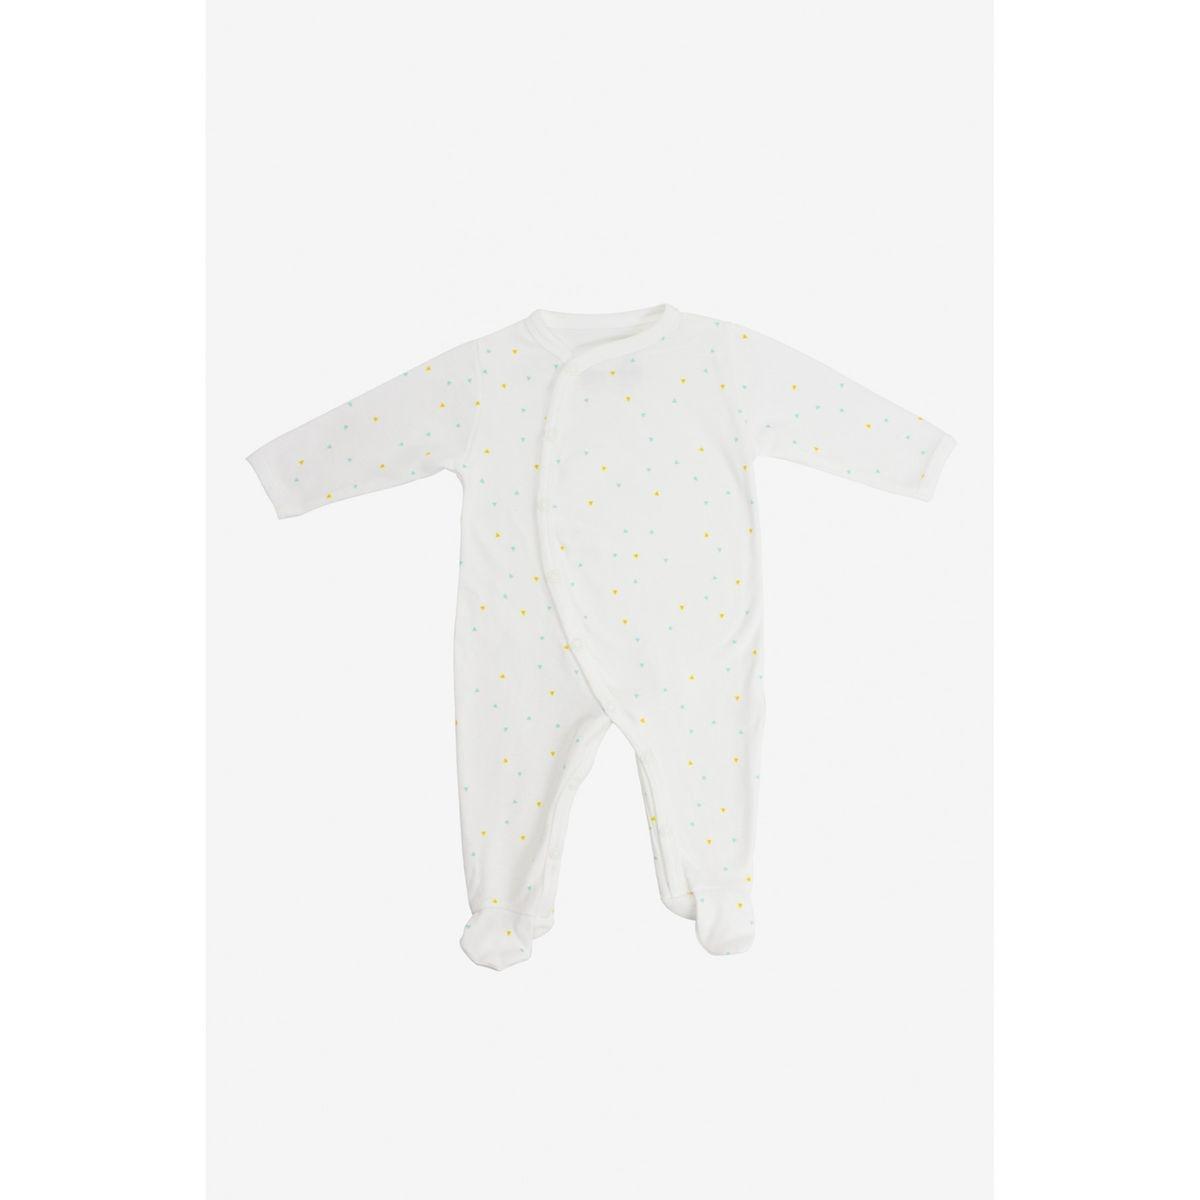 Pyjama bébé été en jersey de coton bio motifs triangles